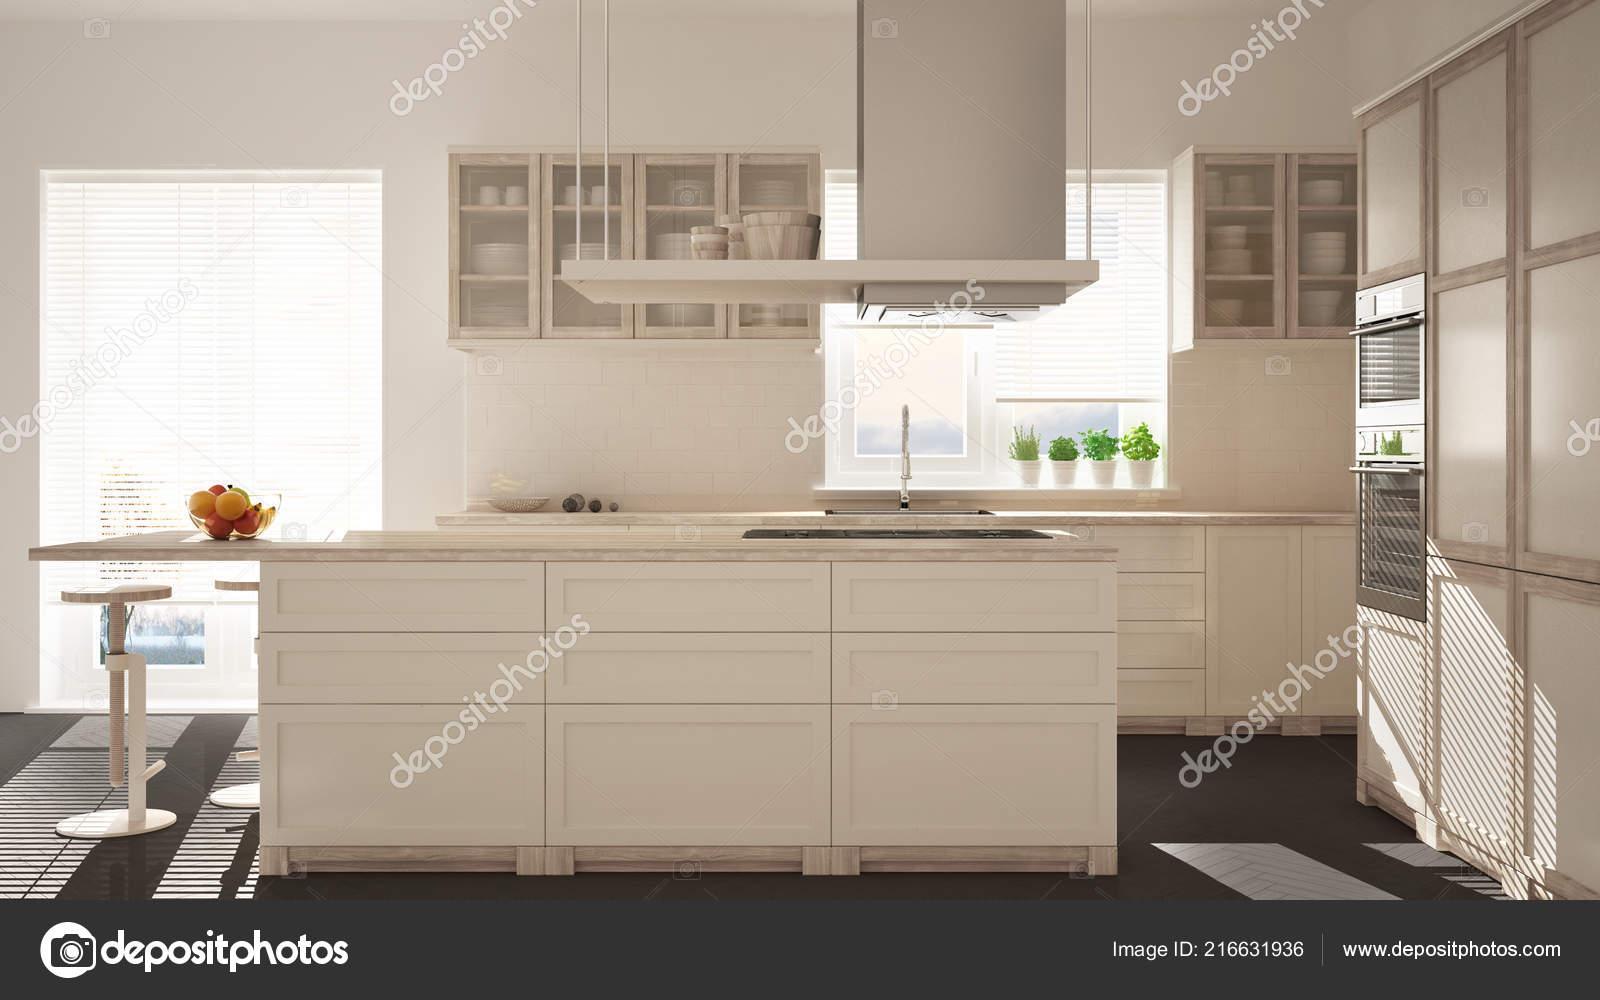 white kitchen floor countertop shelf 现代木制和白色厨房与海岛凳子和窗口镶木地板建筑简约室内设计 图库照片 现代木制和白色厨房与海岛凳子和窗口镶木地板建筑简约